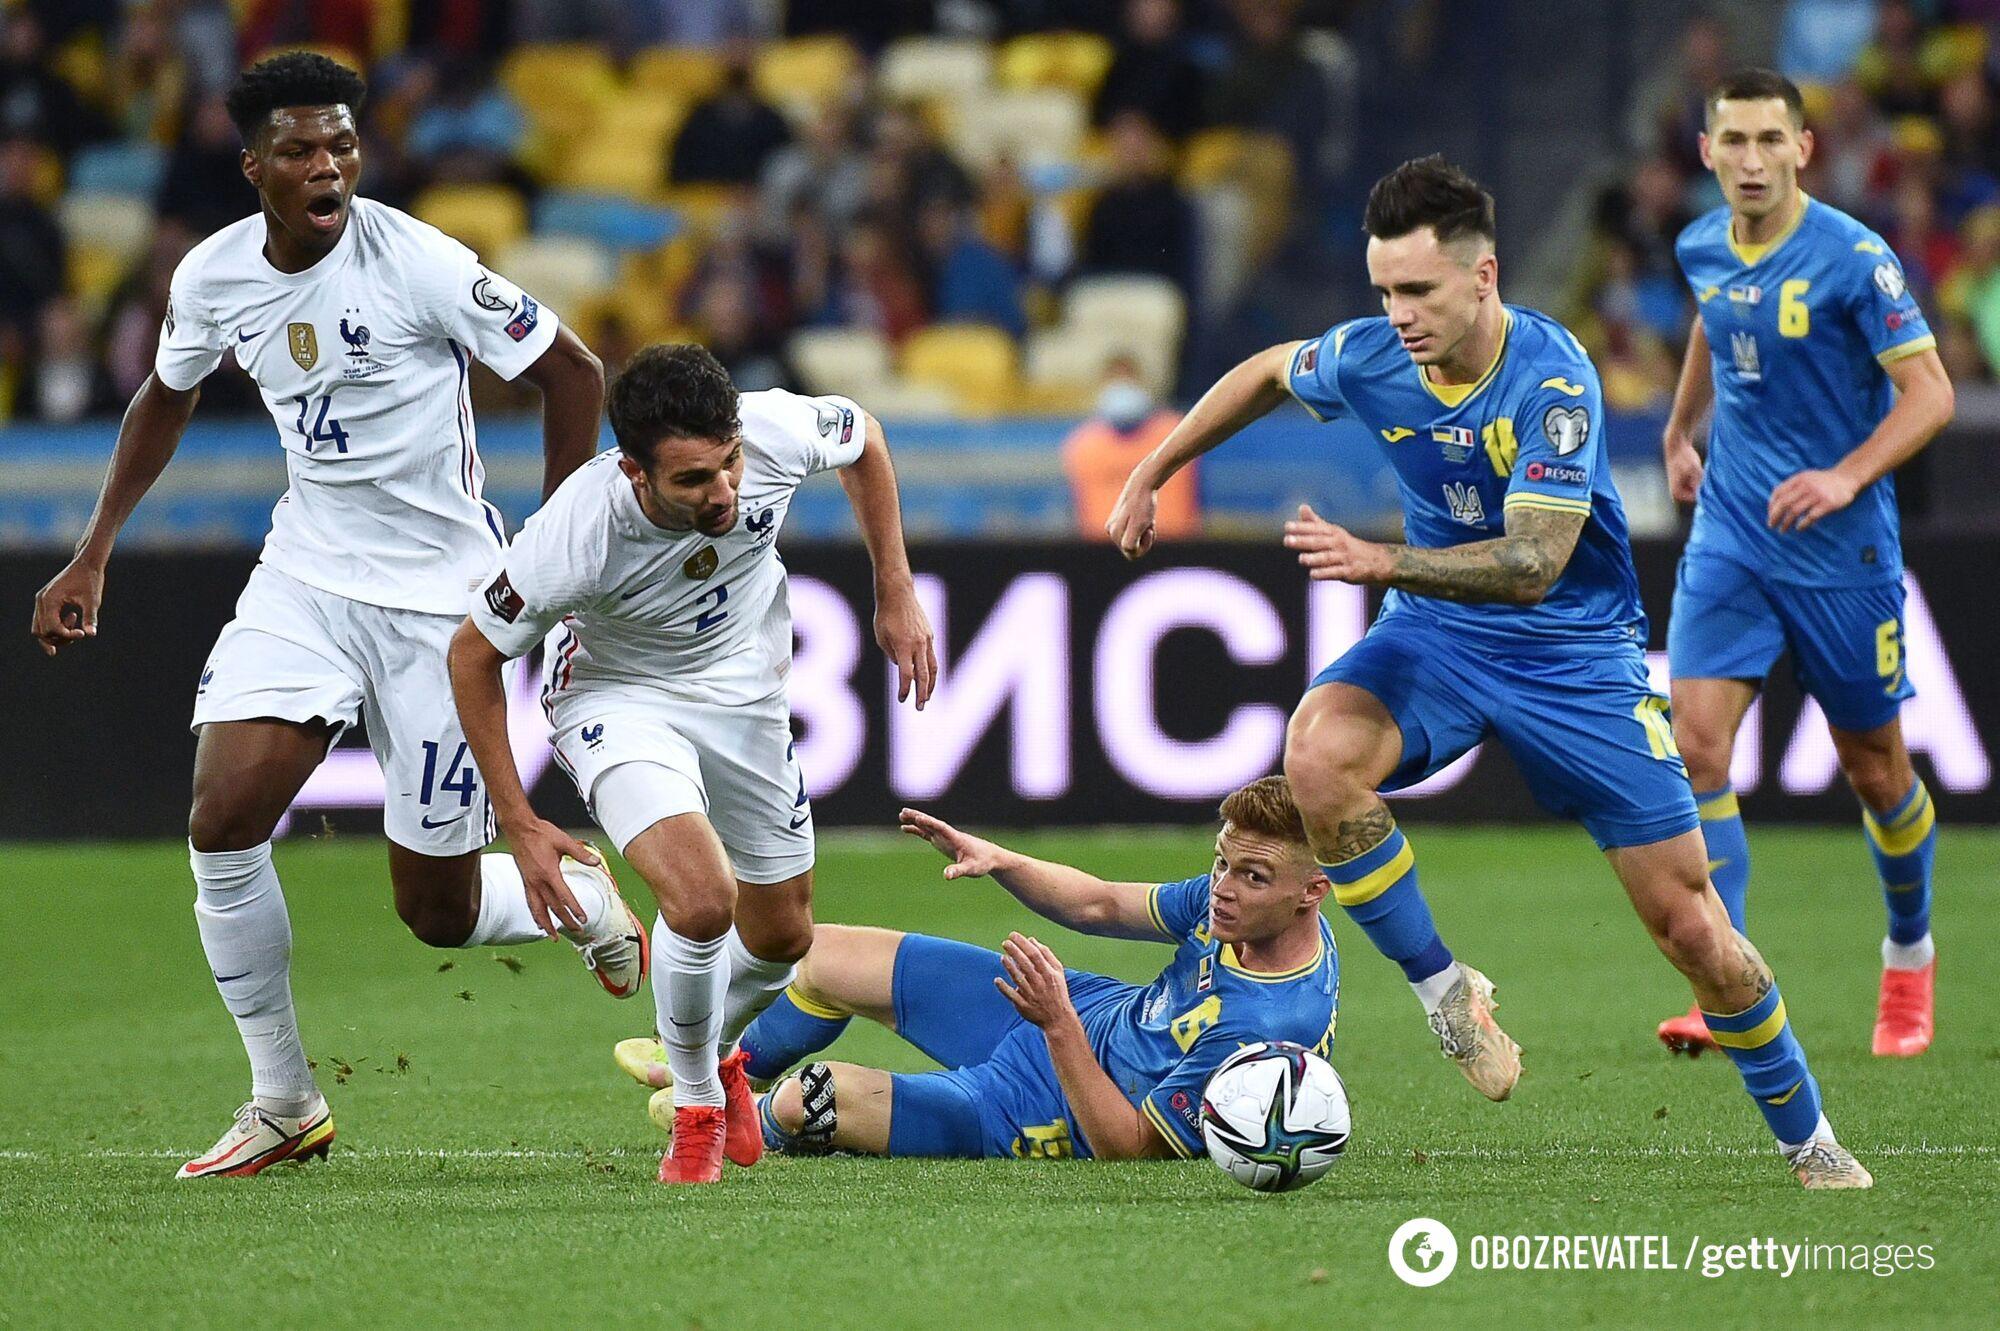 Шапаренко забил потрясающий гол в ворота французов